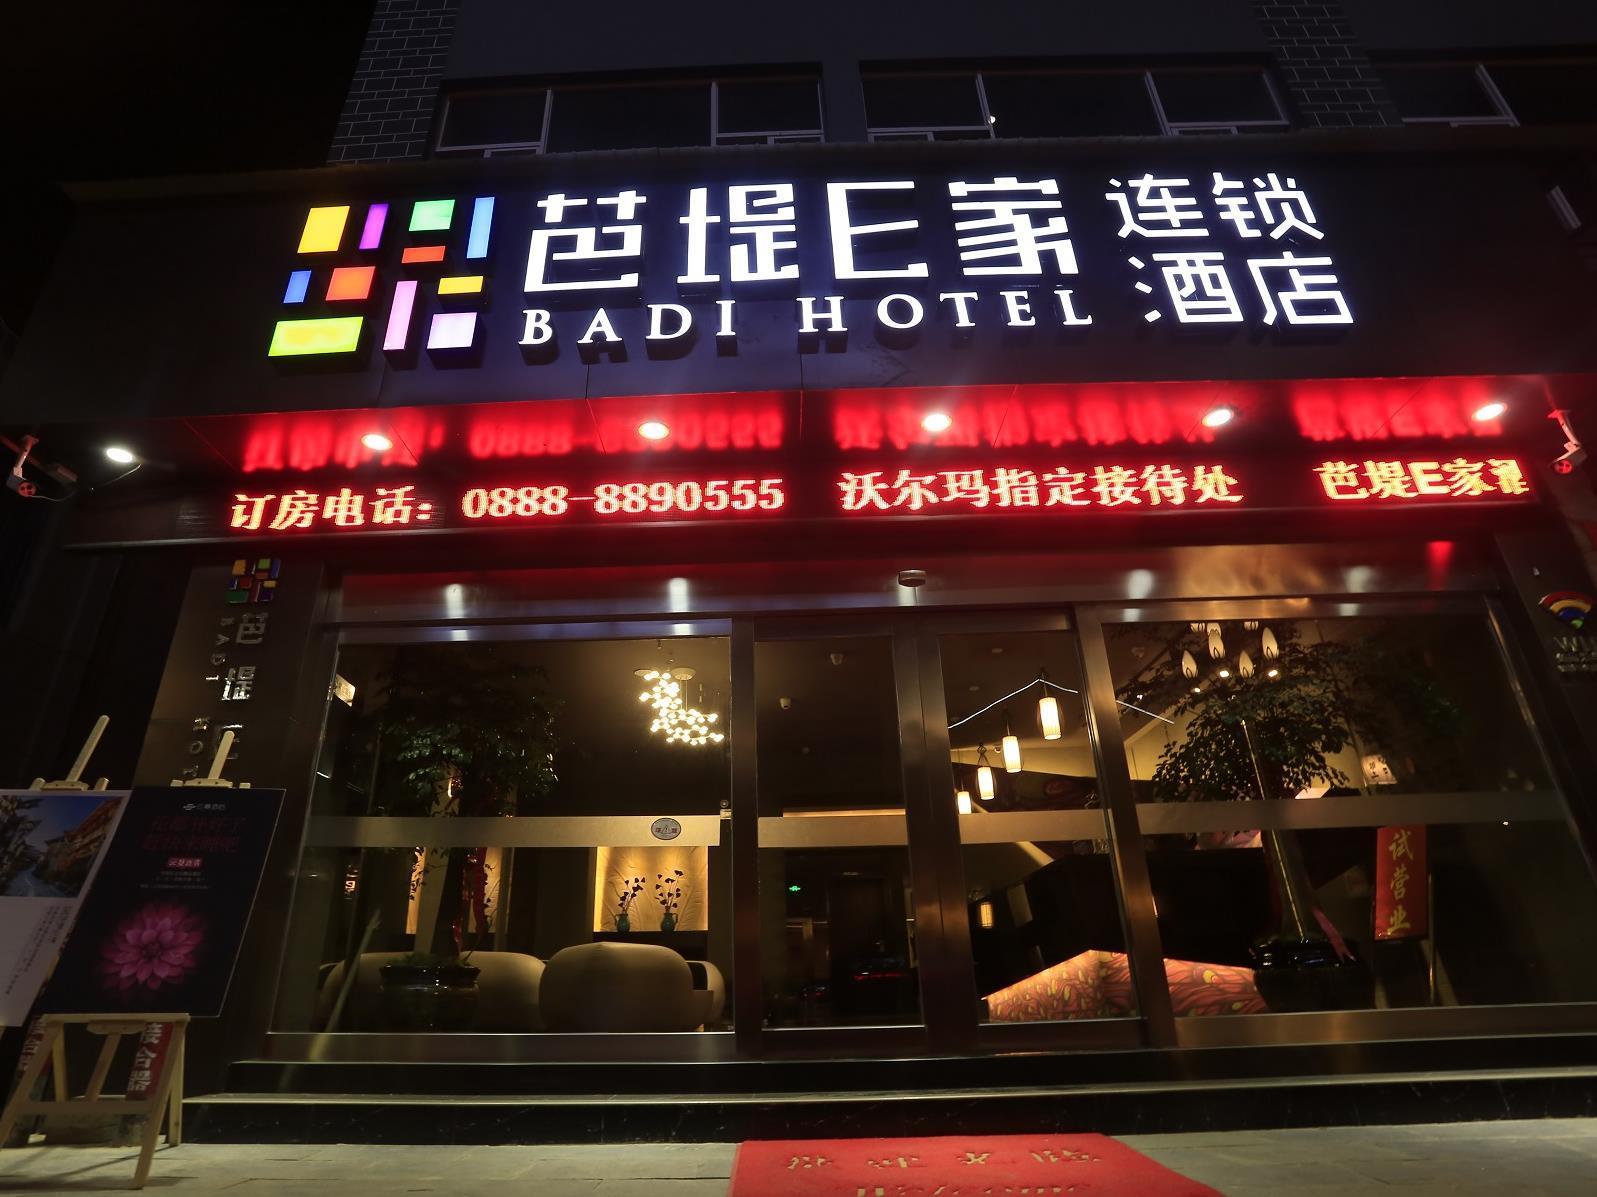 Badi Hotel Lijiang Branch